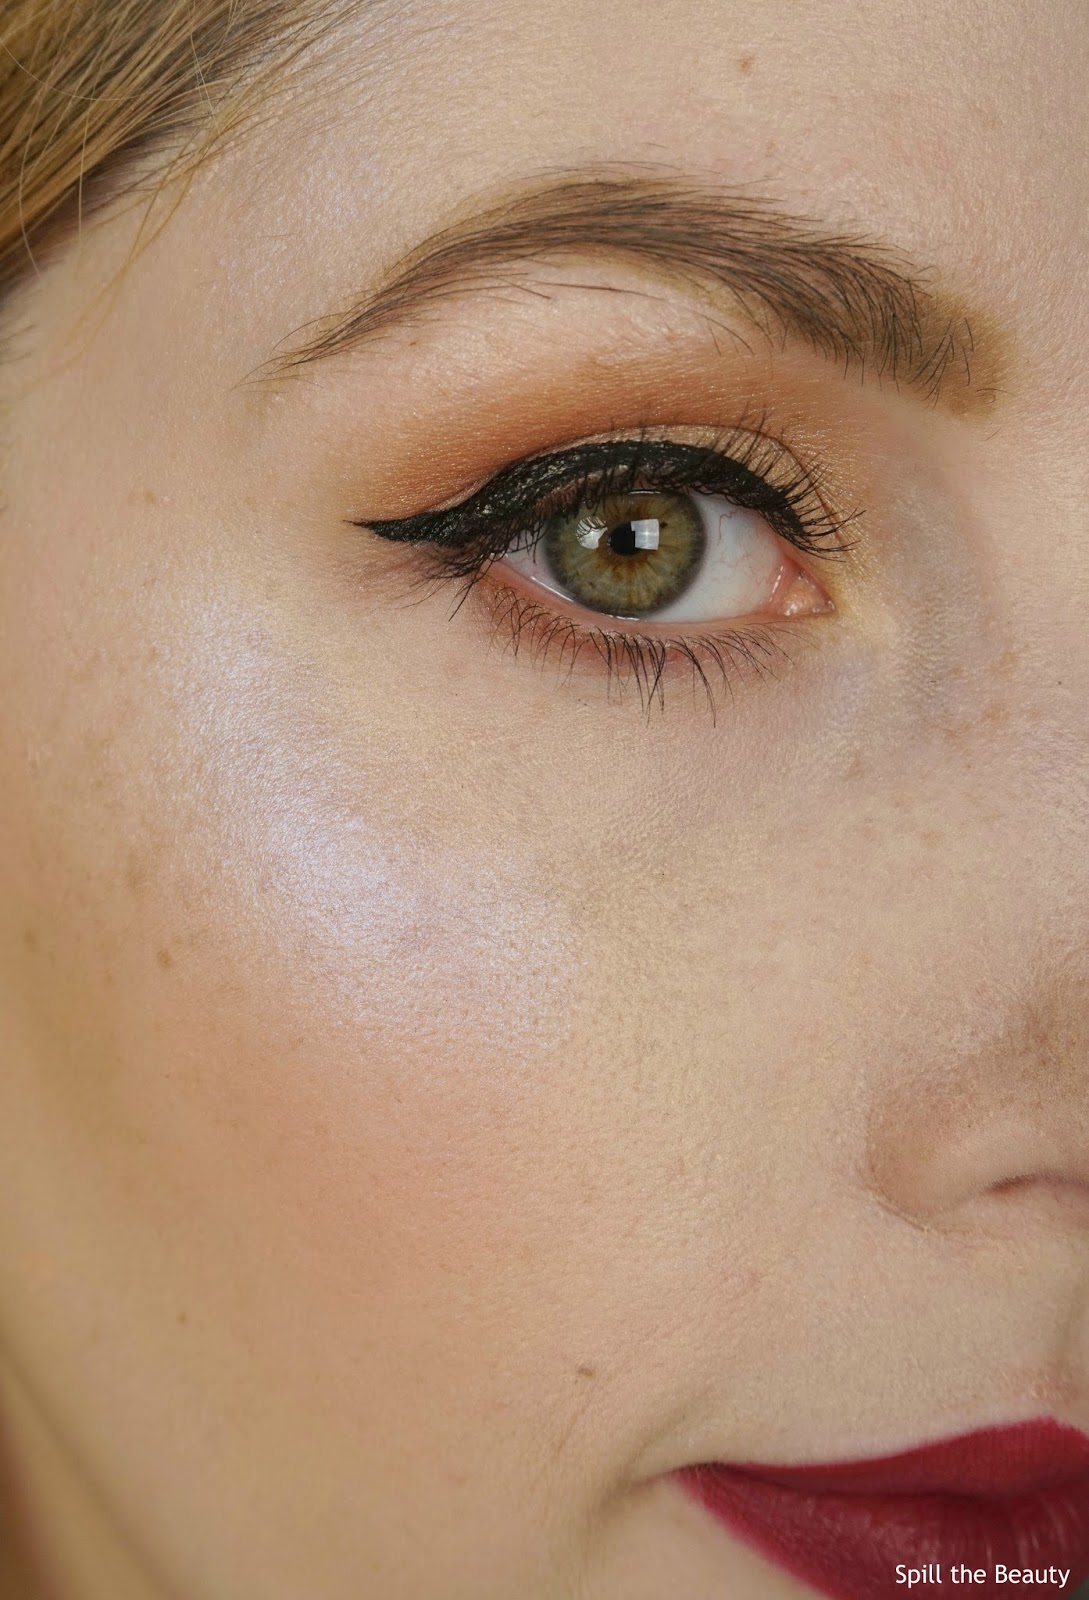 cover fx custom enhancer drops liquid highlighter halo tops of cheeks eyeliner lips